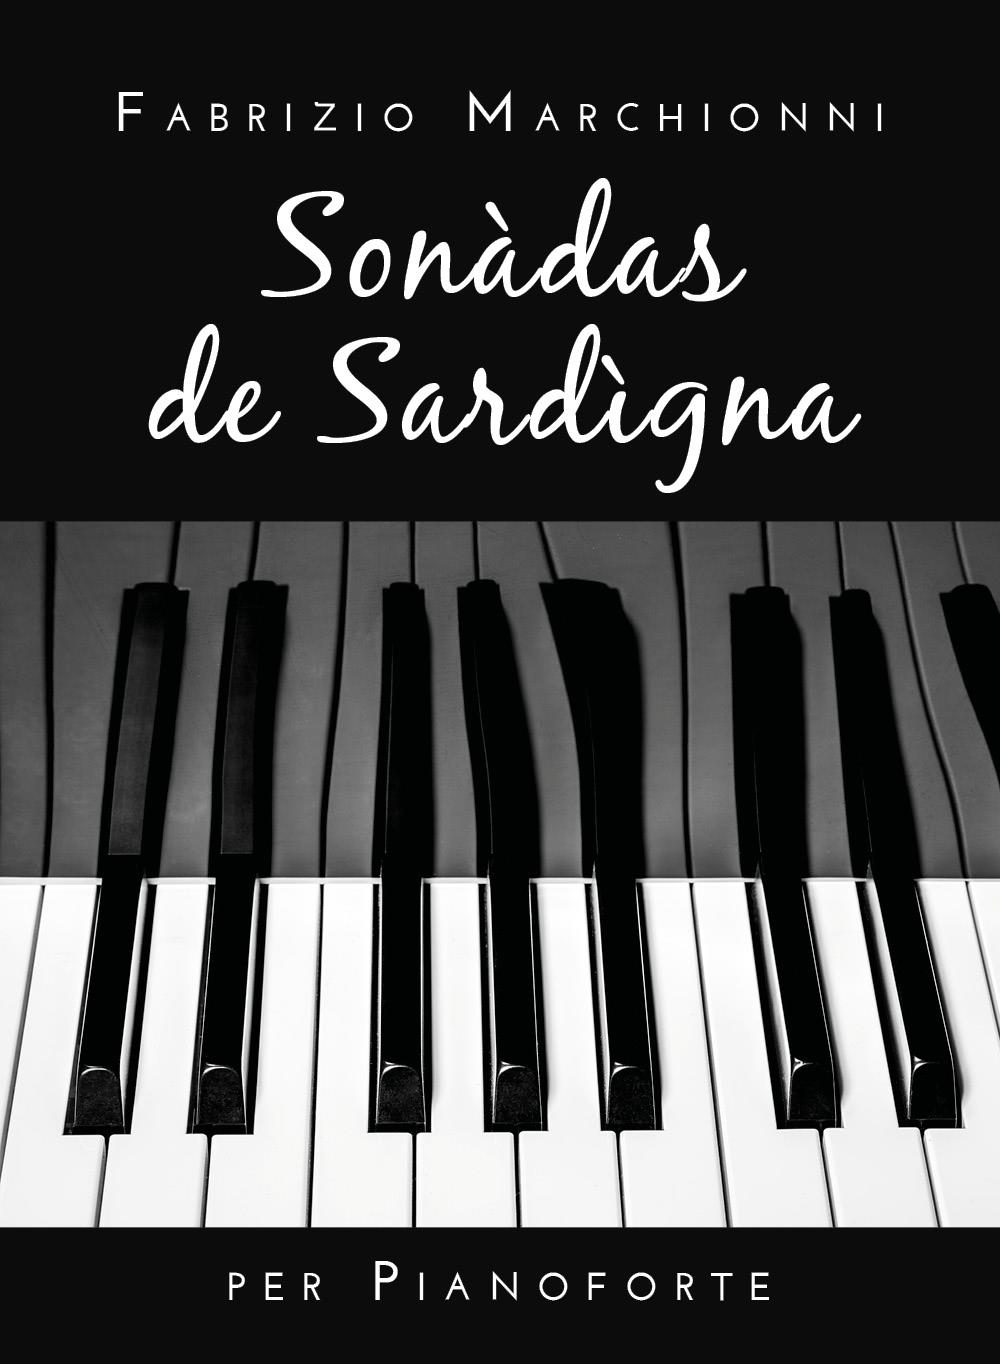 Sonàdas de Sardìgna